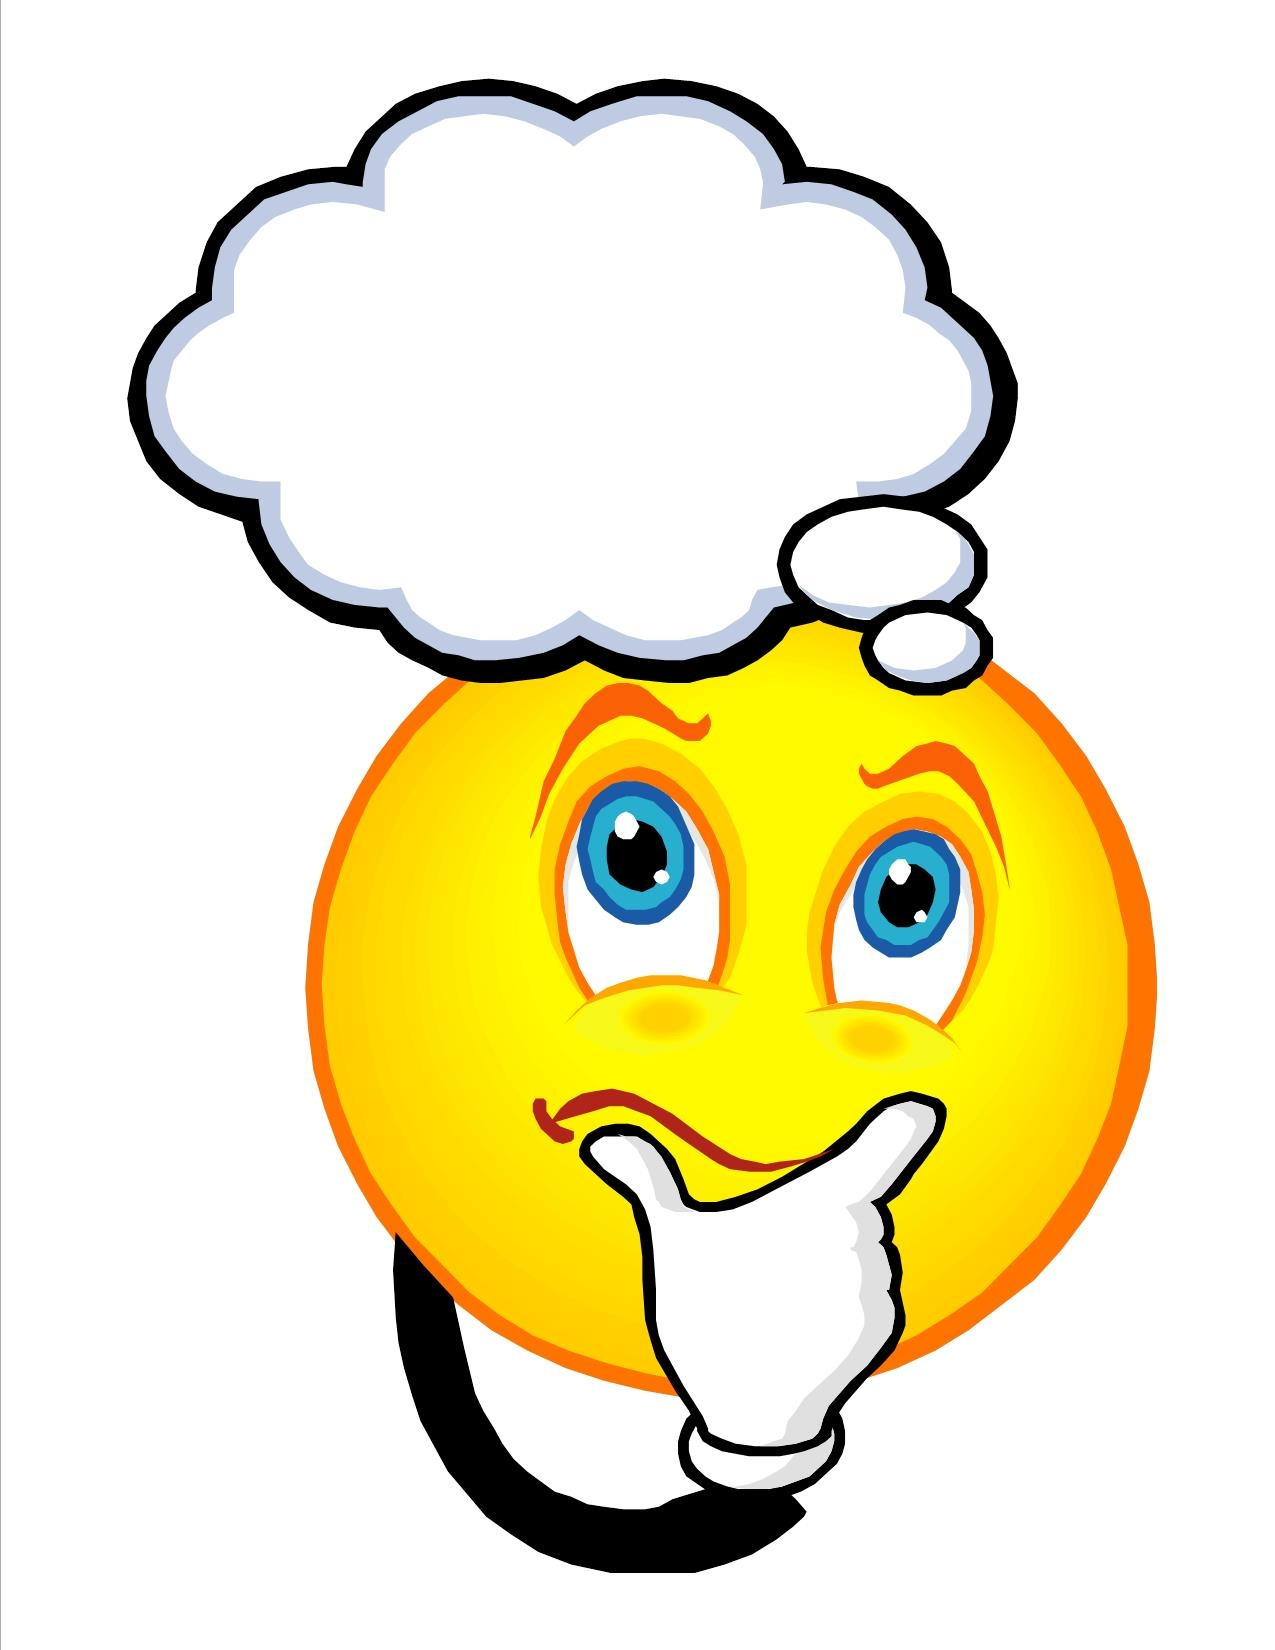 5d234a3153254892c1fff64da6d9120a_thinking-smiley-face-clip-art-clipart-thinking-face_1275-1650.jpeg